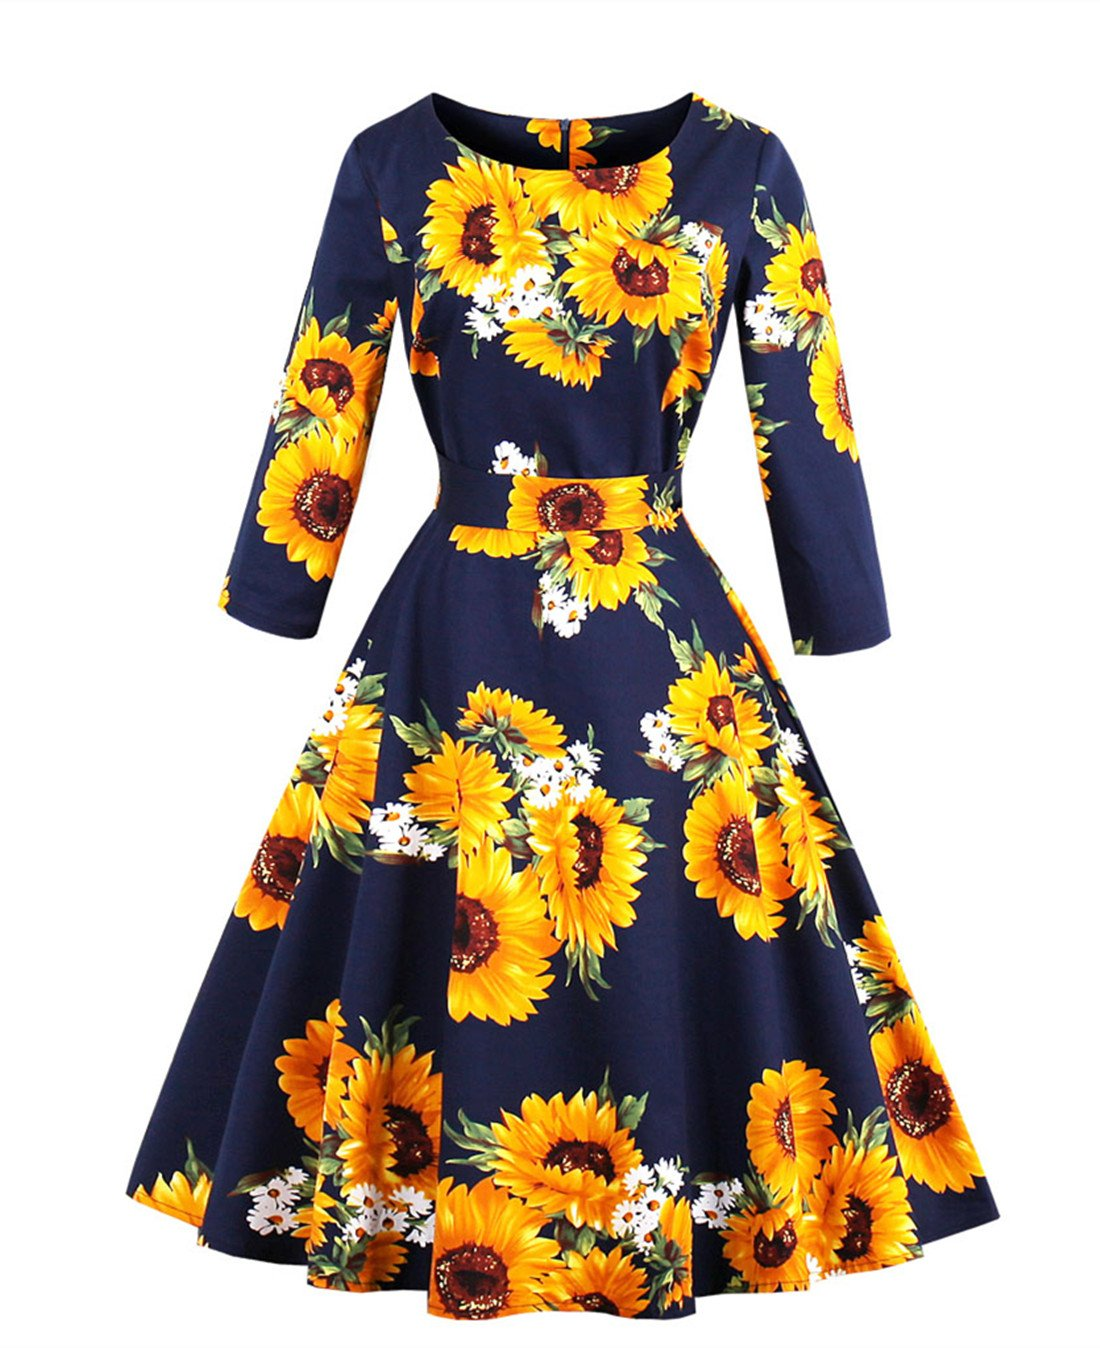 Available at Amazon: Wellwits Women's 3 4 Sleeve Waist Tie Sunflower Print Vintage Swing Tea Dress